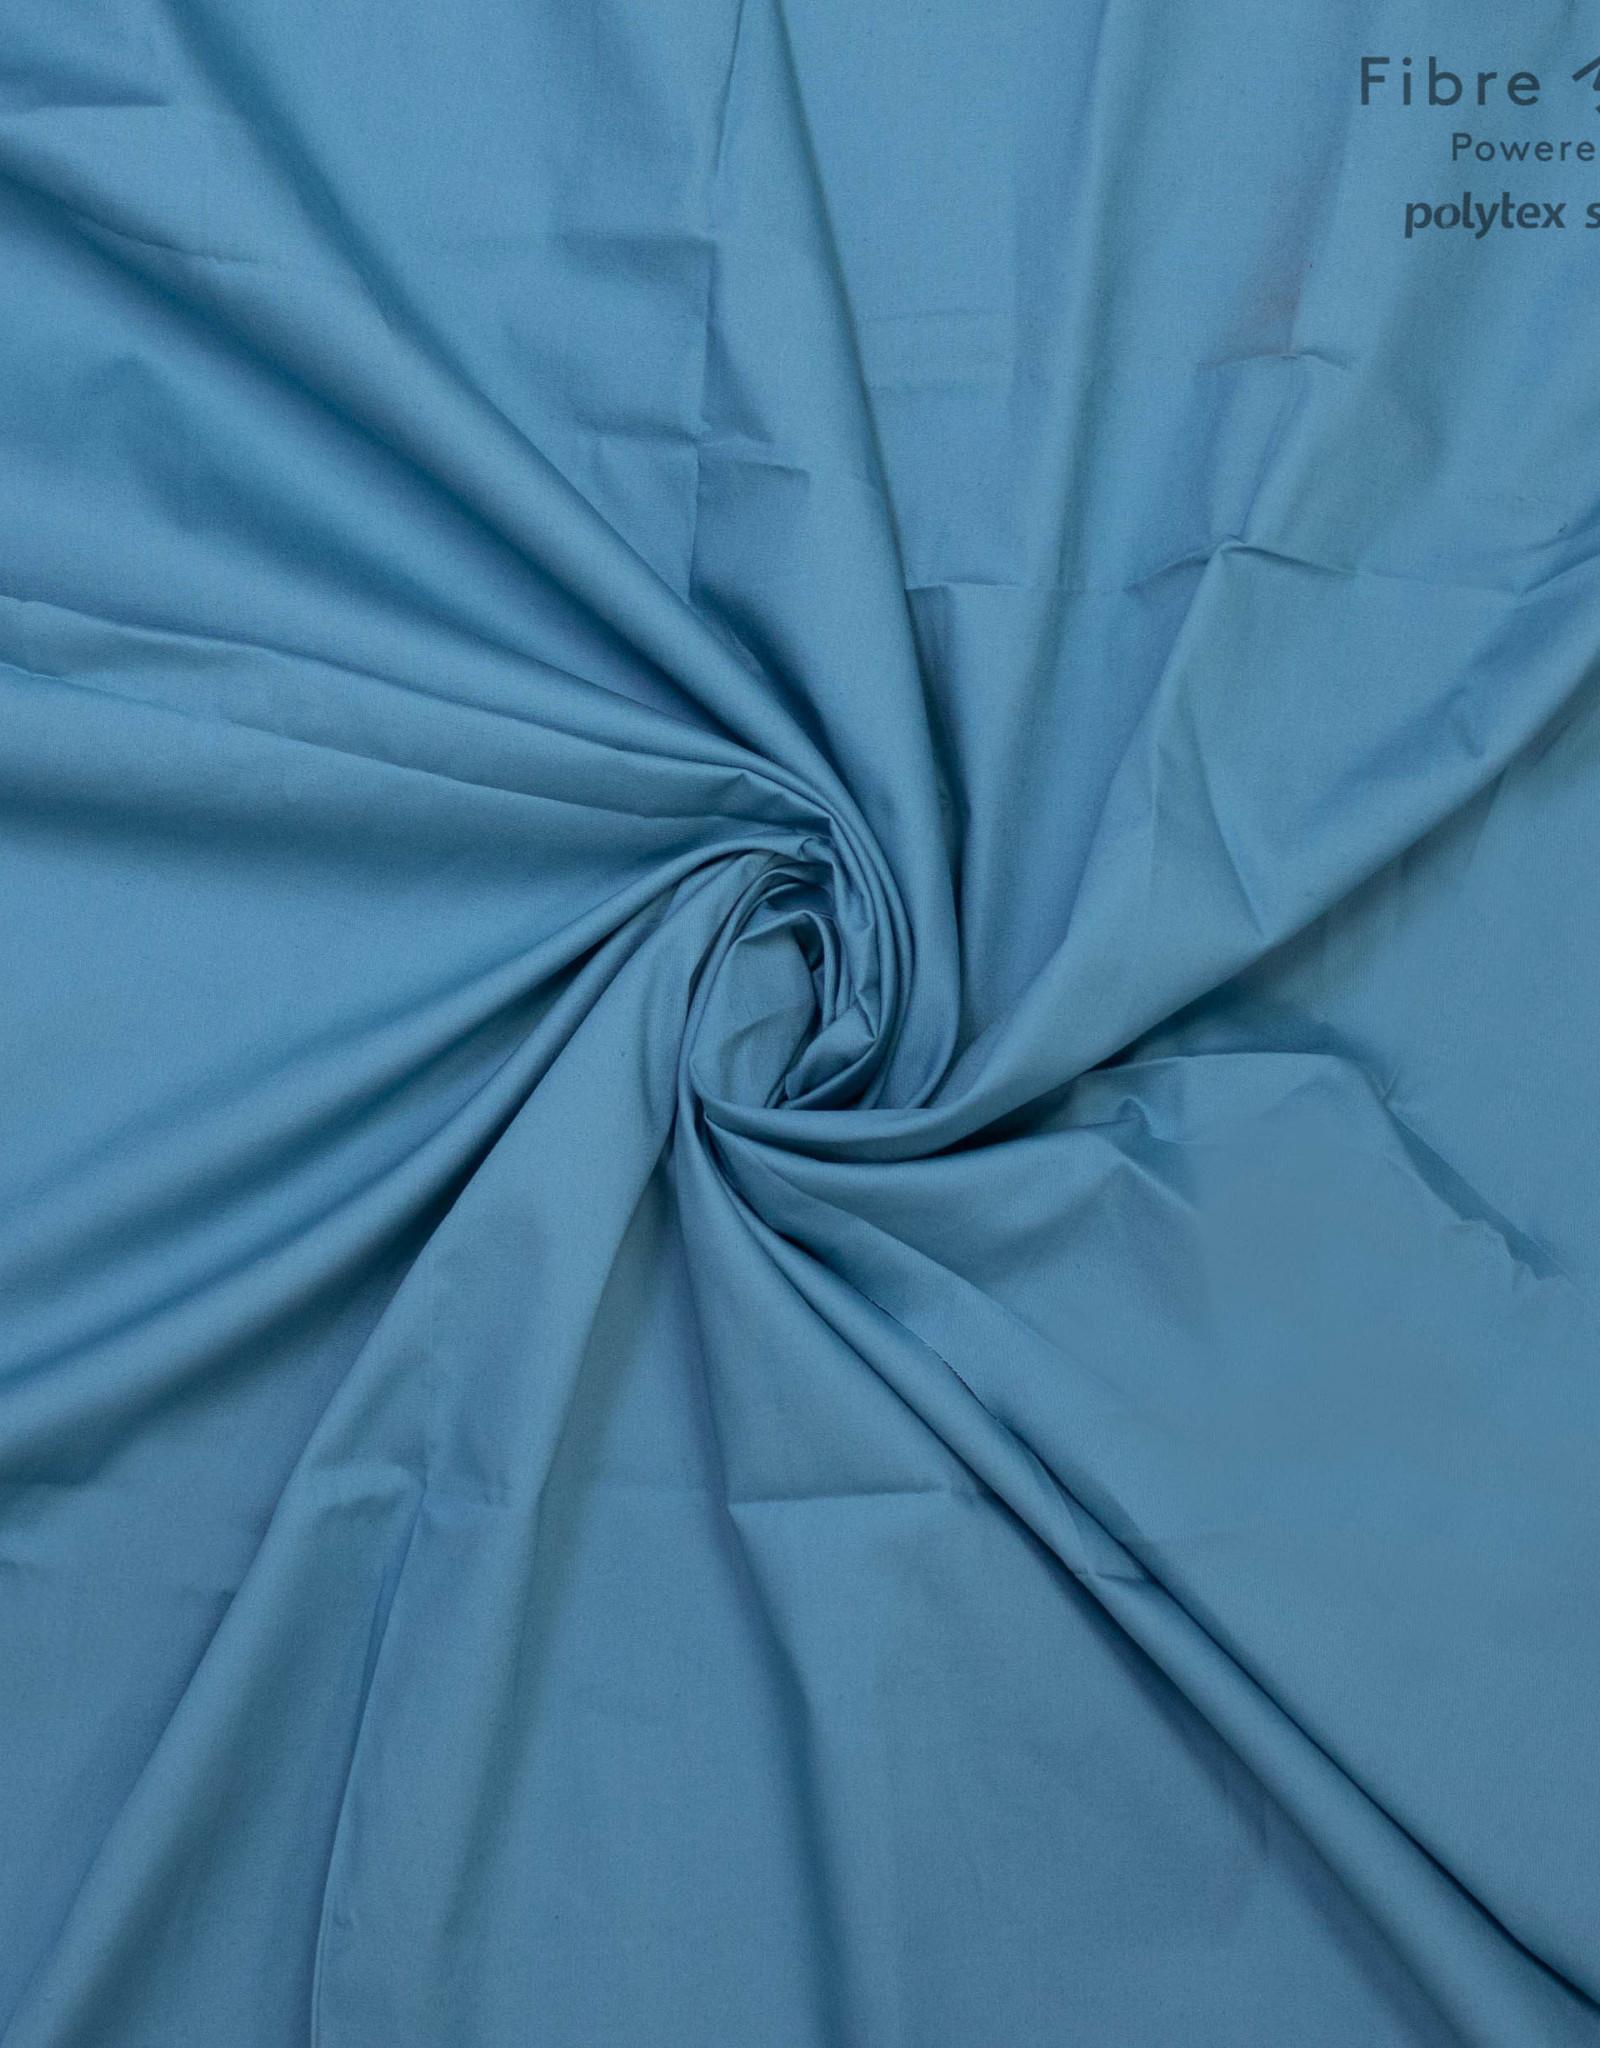 Fibre Mood FM Onah poplin adriatique blue